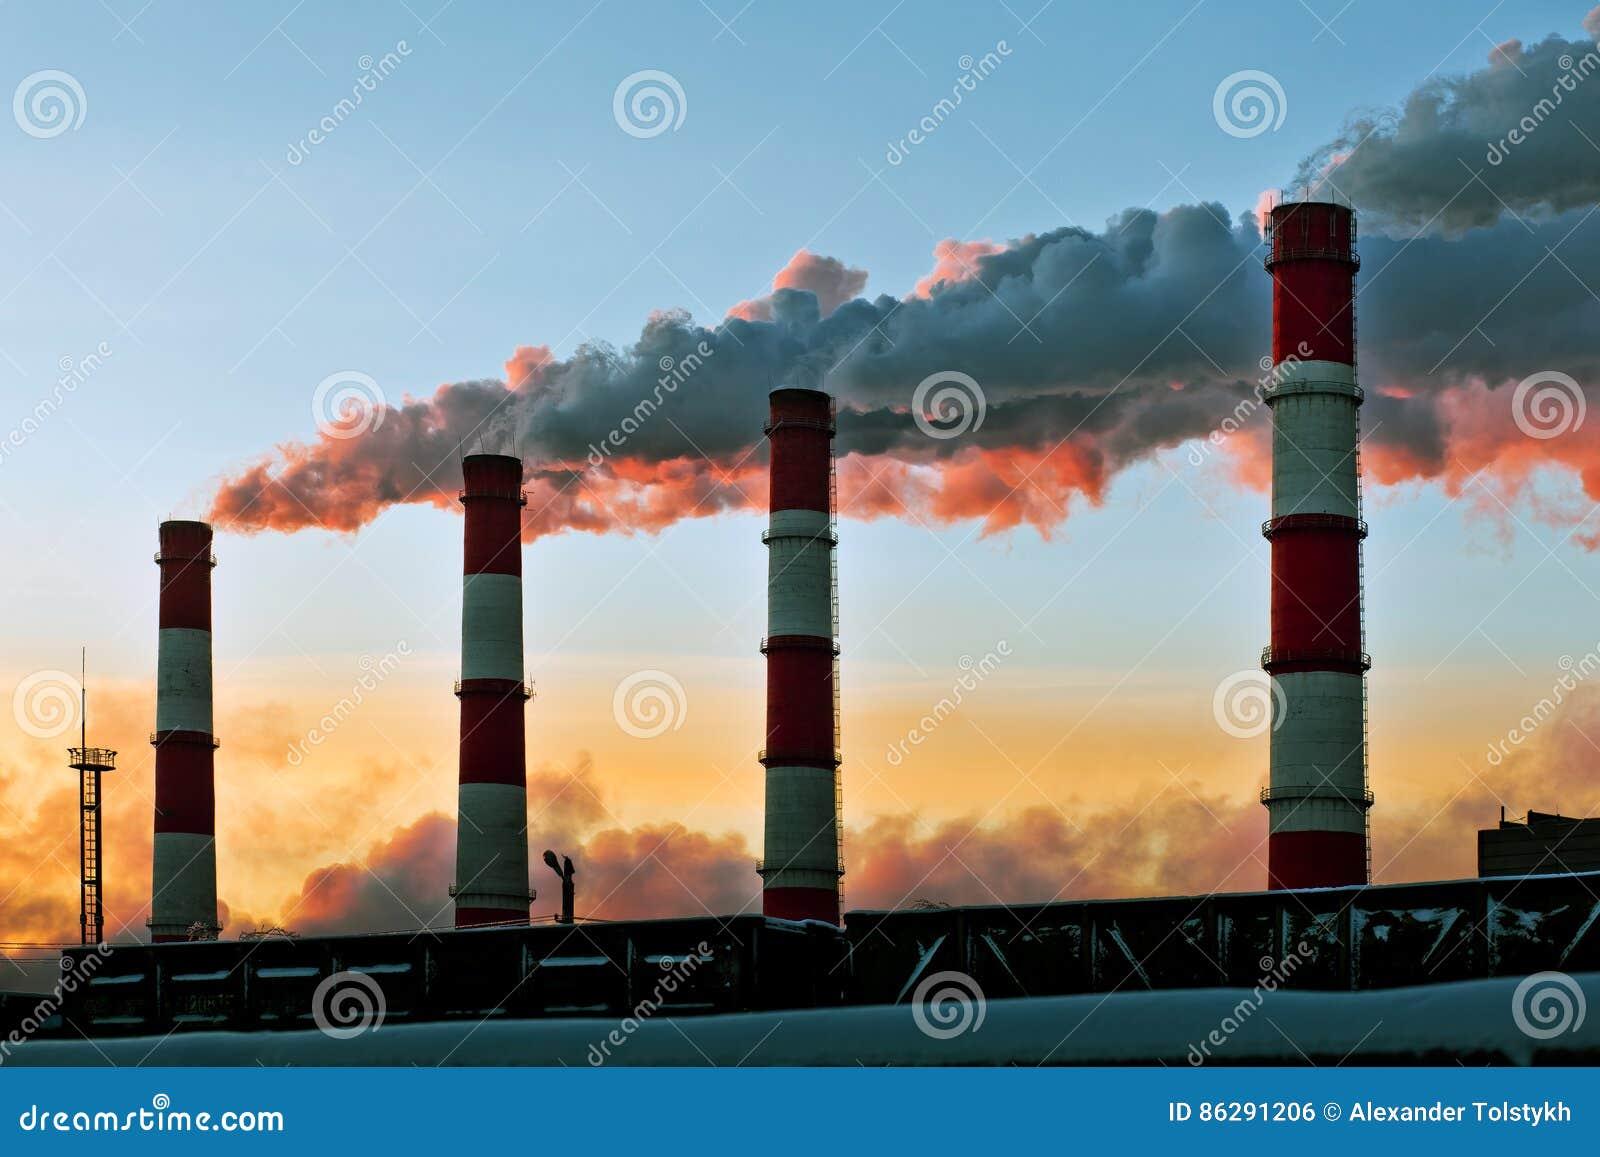 Luchtvervuilingsfabriek